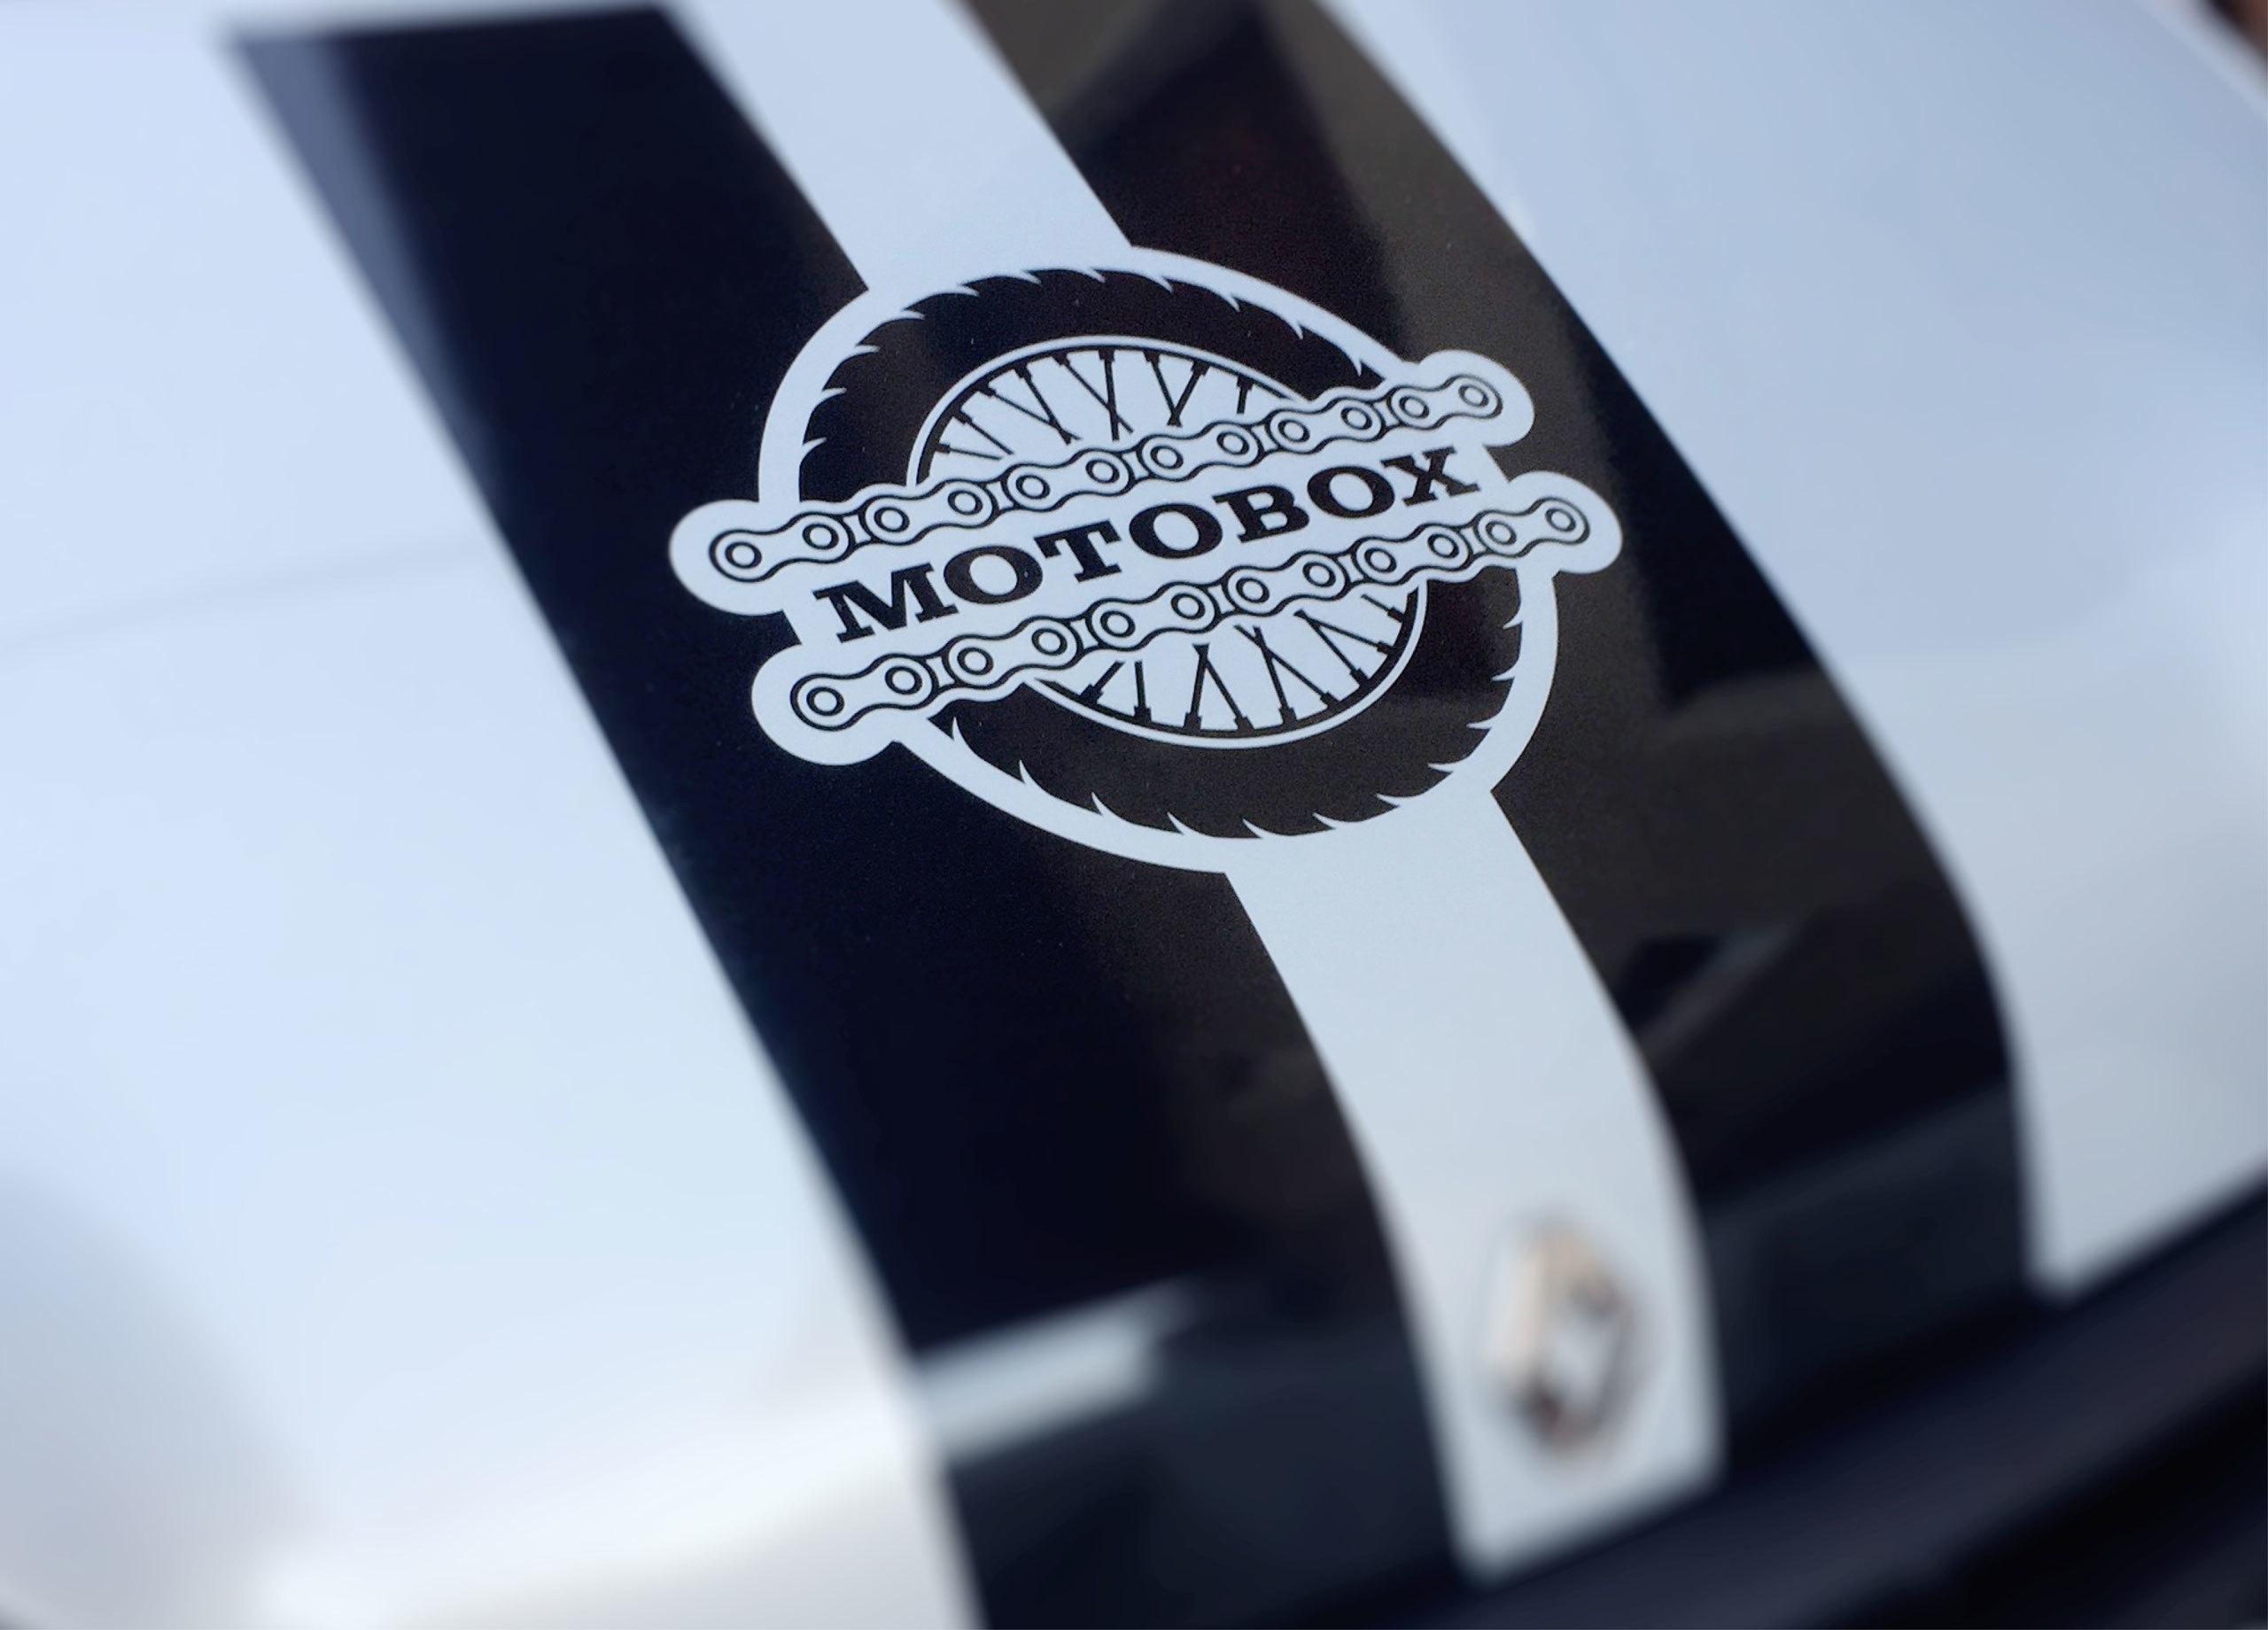 Motobox Autobeschriftung MHG Bern